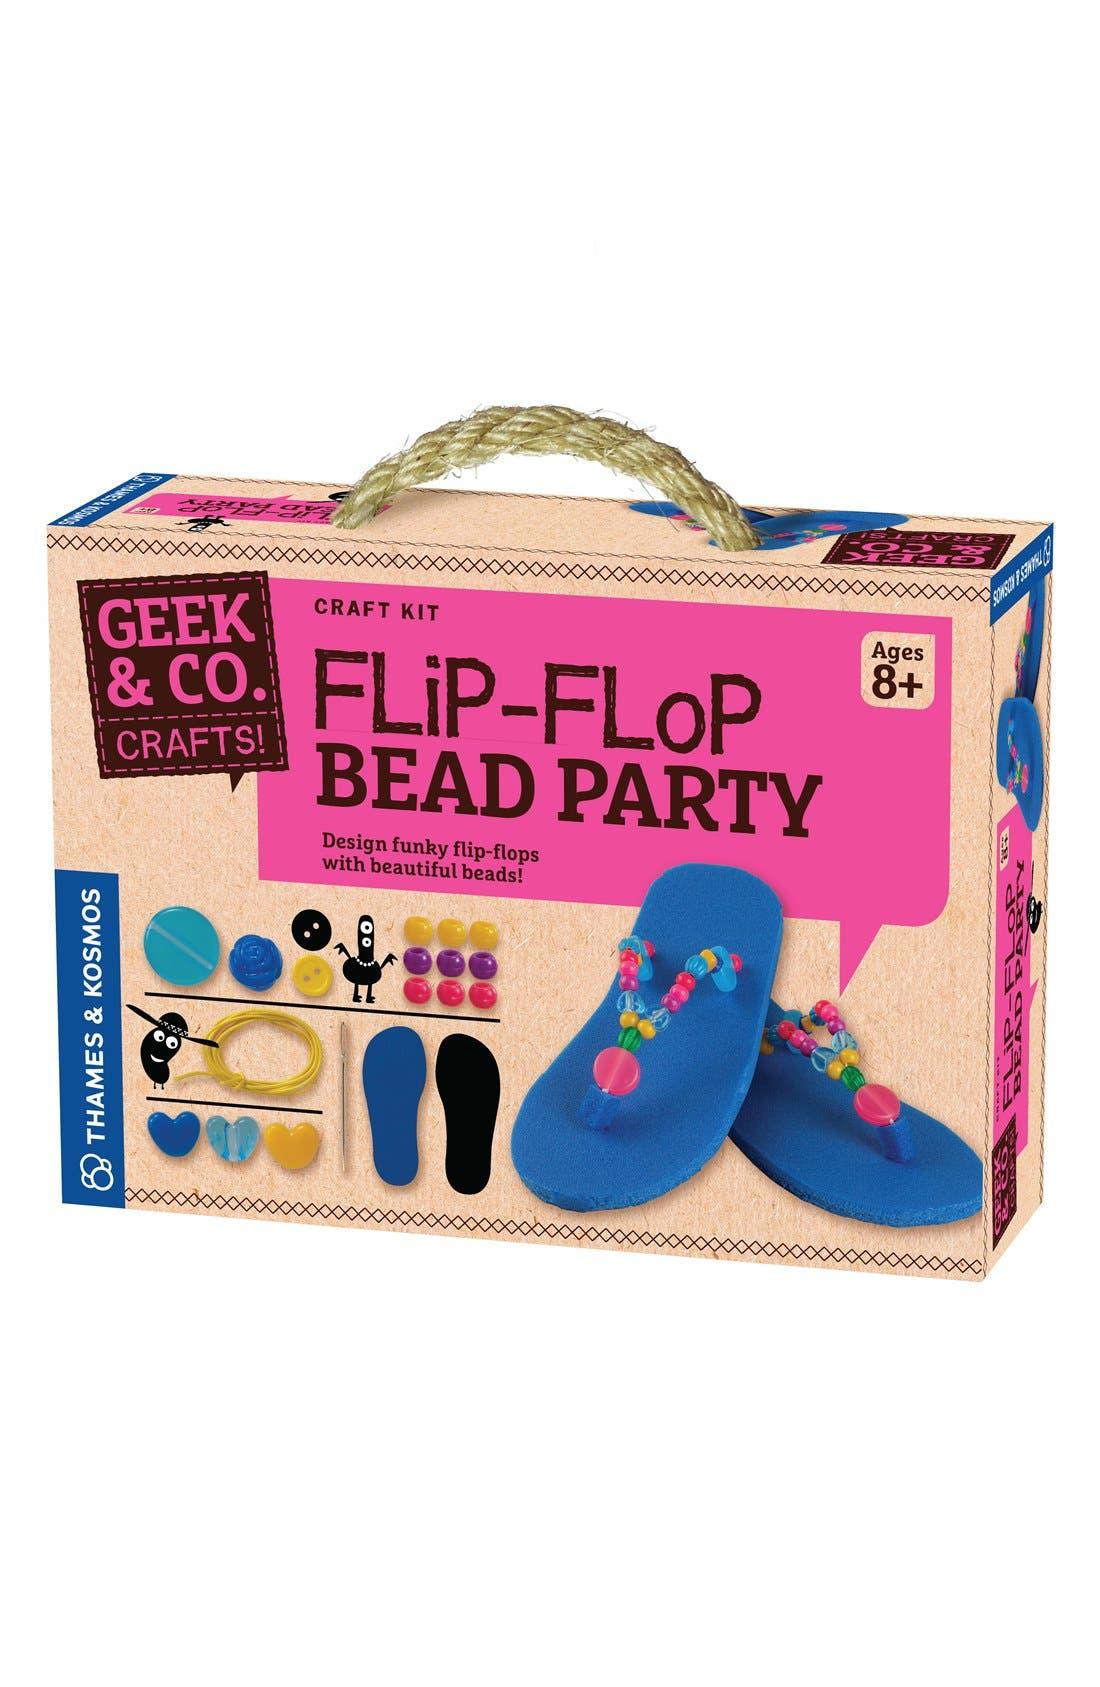 Thames & Kosmos 'Flip-Flop Bead Party' Kit